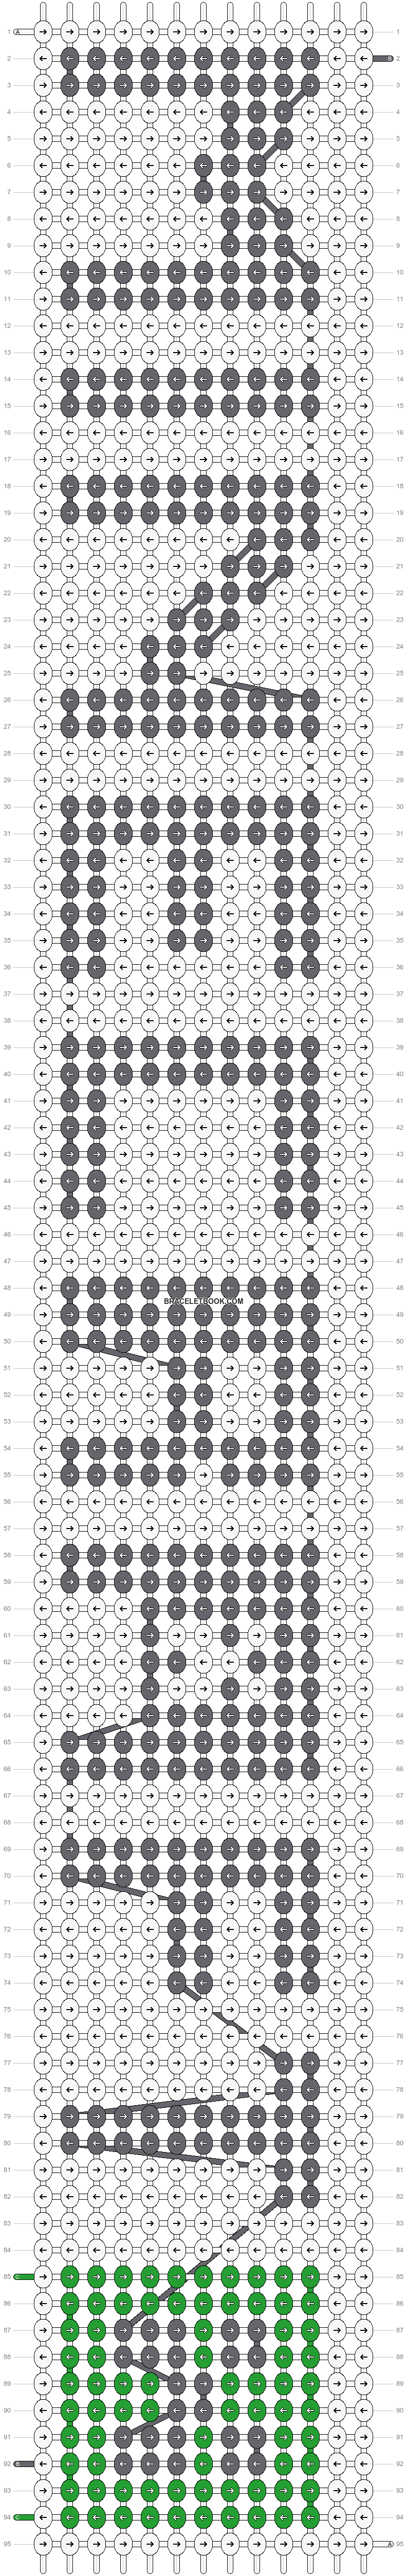 Alpha pattern #12957 pattern